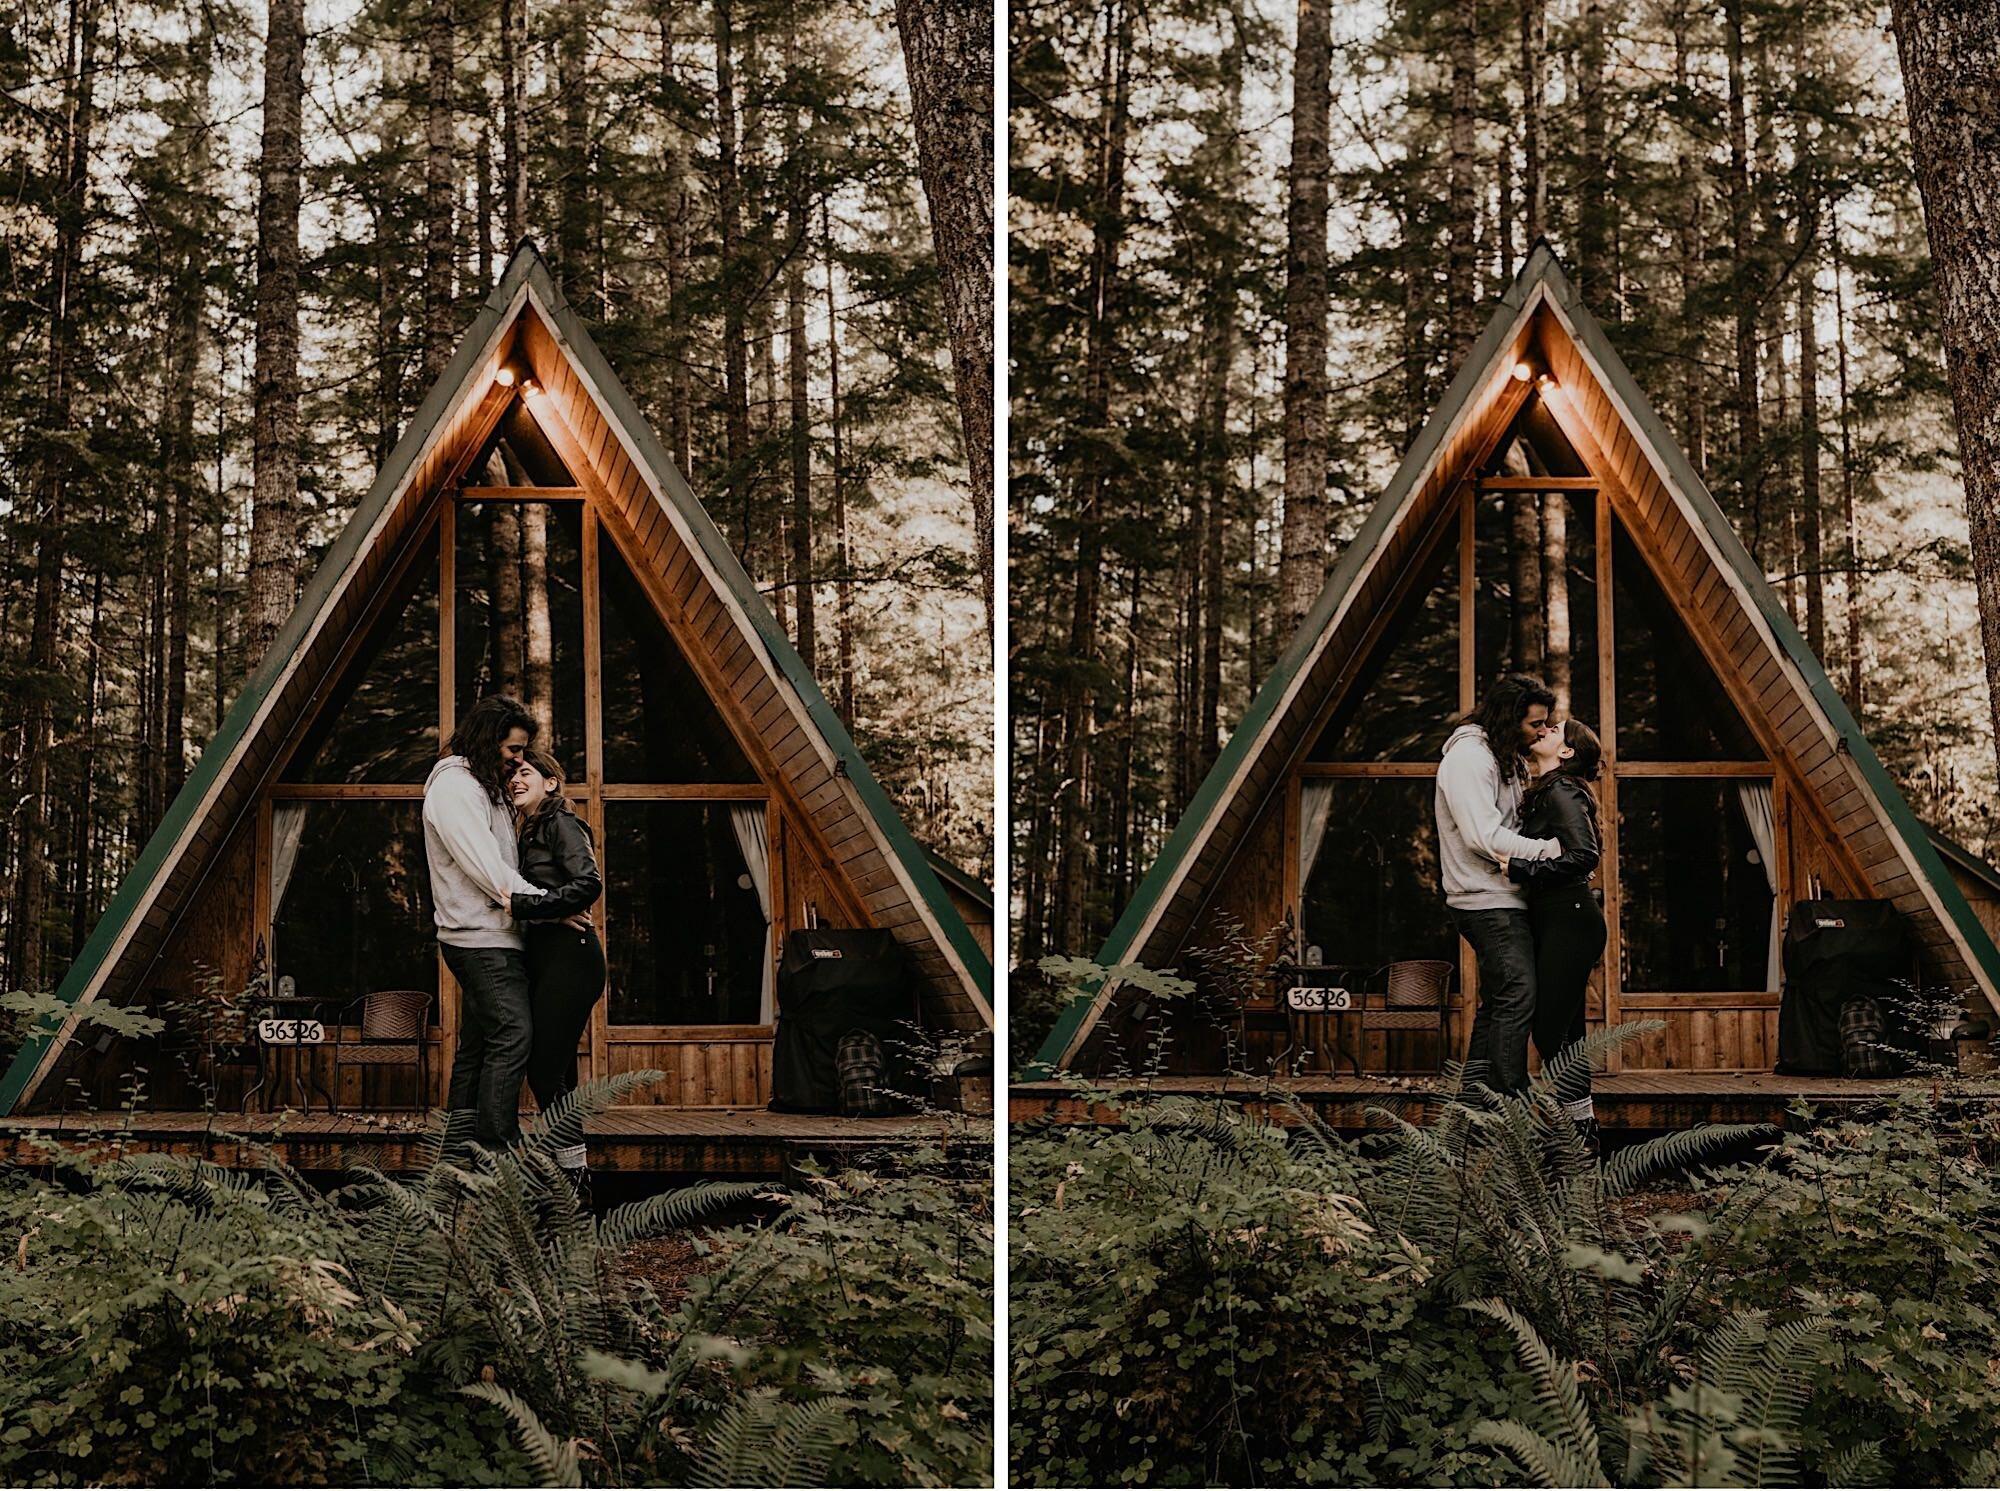 PNW A-frame cabin near Mount Rainier National Park before their elopement